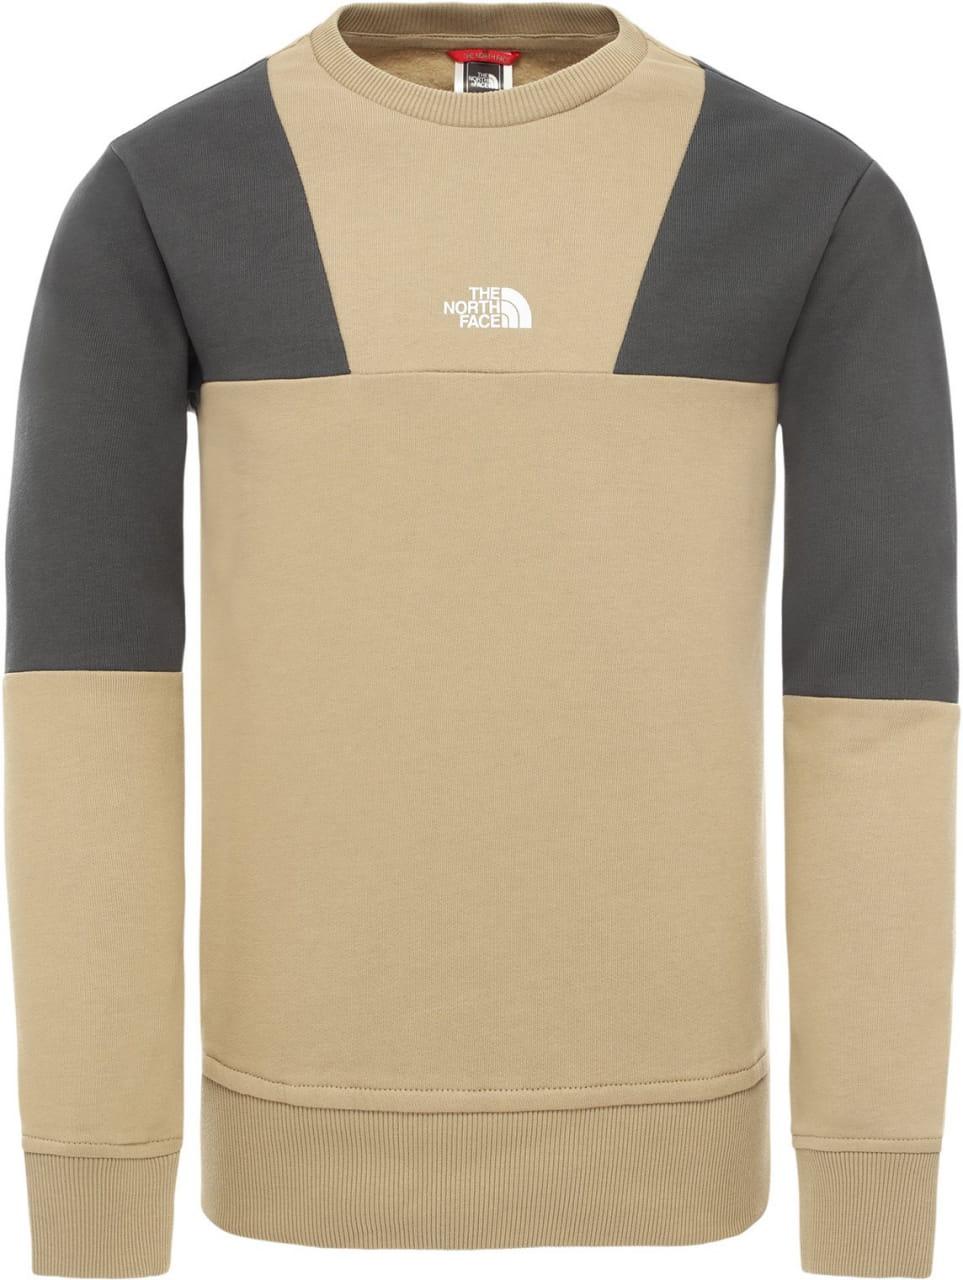 Sweatshirts The North Face Youth Yafita Pullover